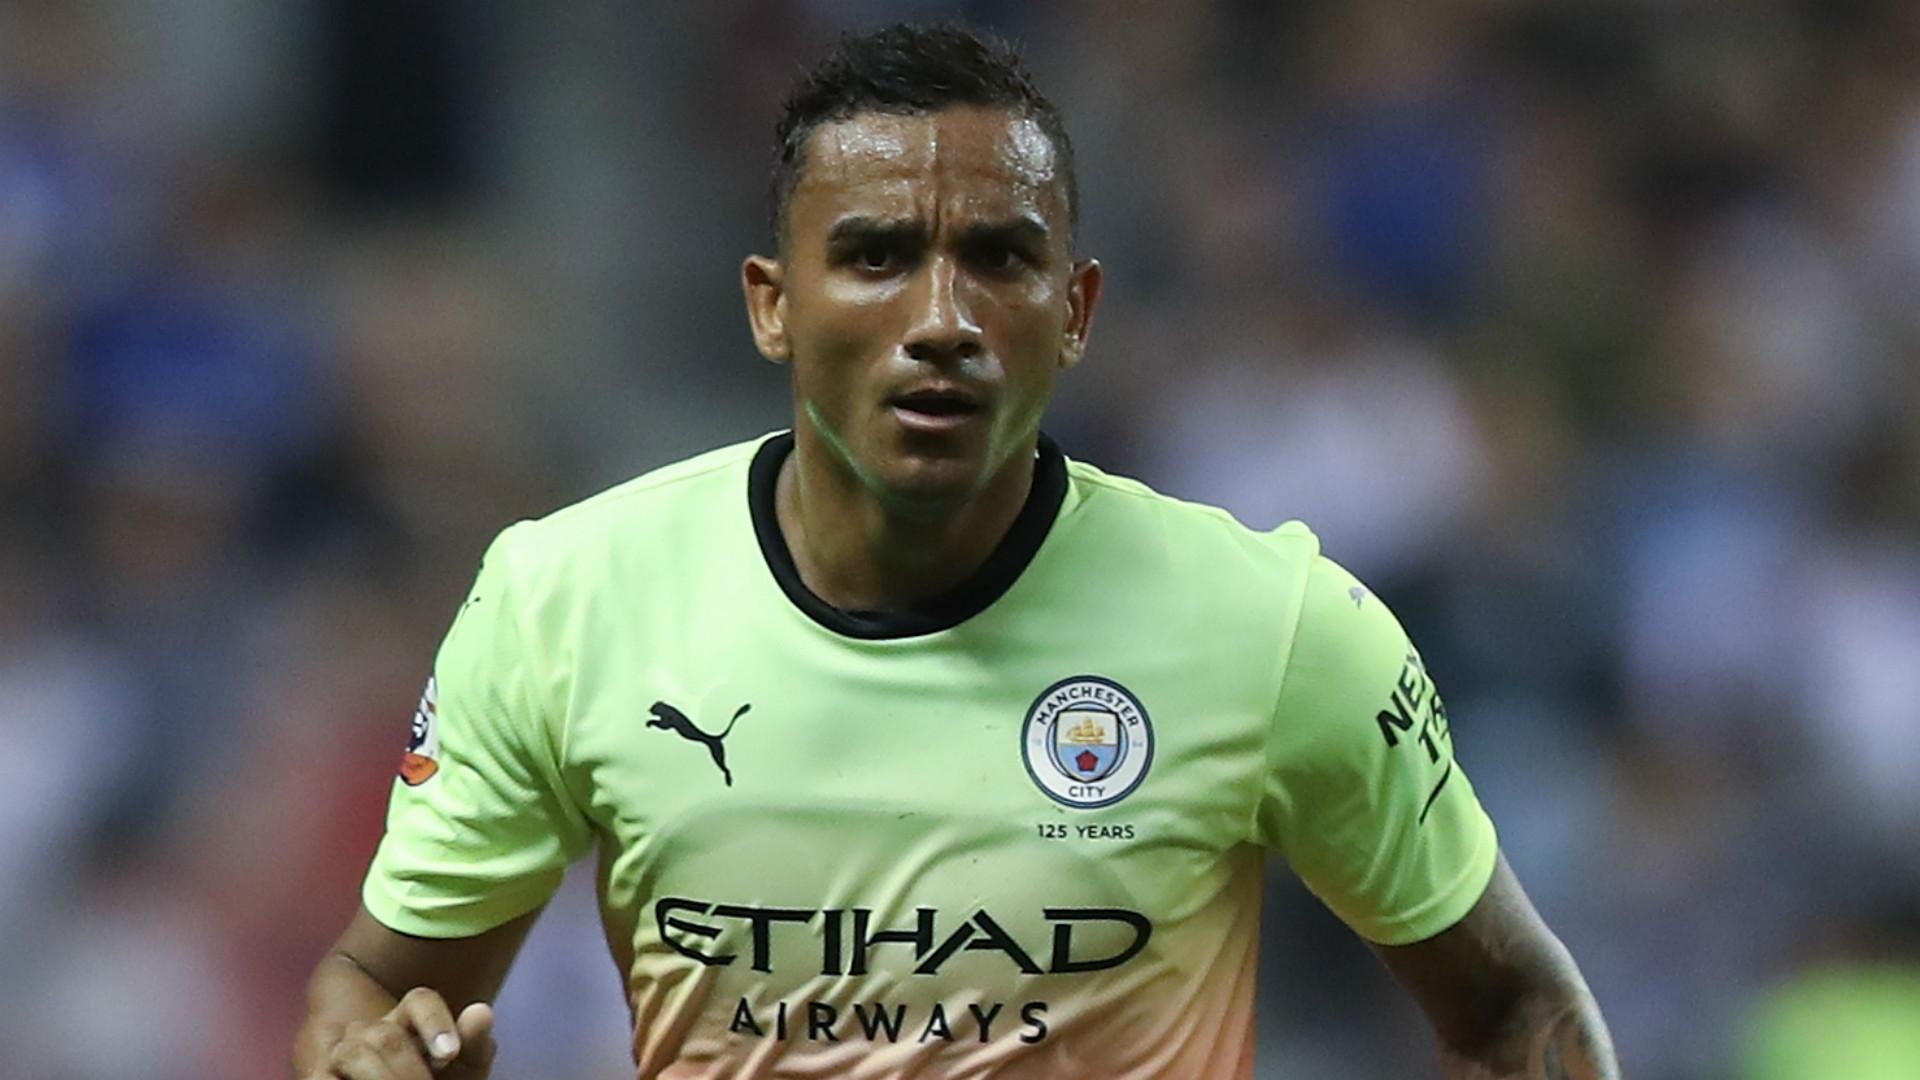 Corsport - Cancelo e Danilo, lo scambio si chiude a Wembley